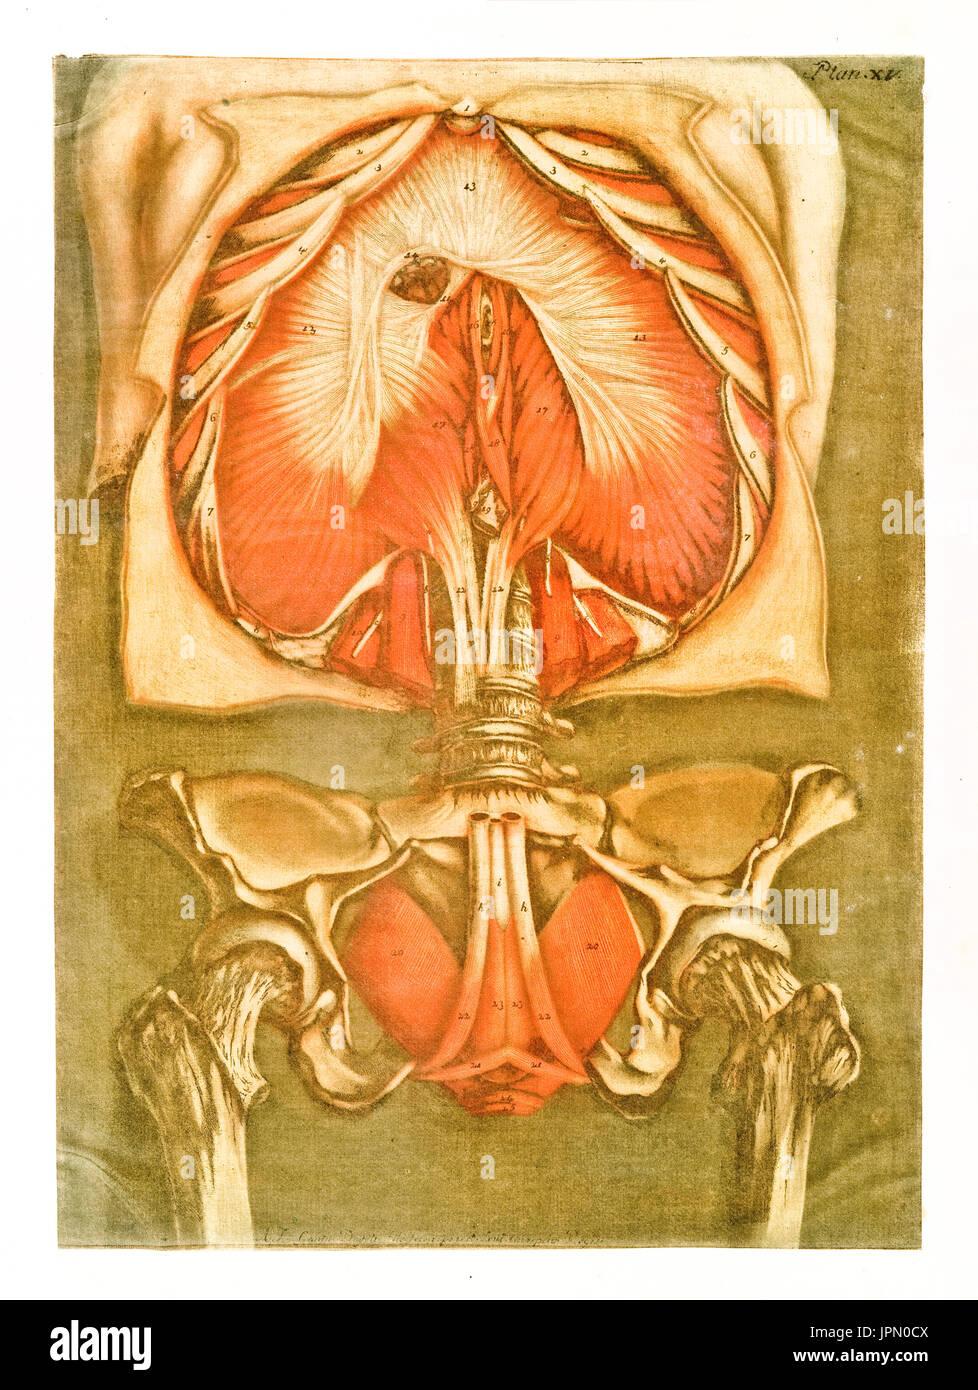 Human Anatomy Engraving Vintage Stock Photos & Human Anatomy ...